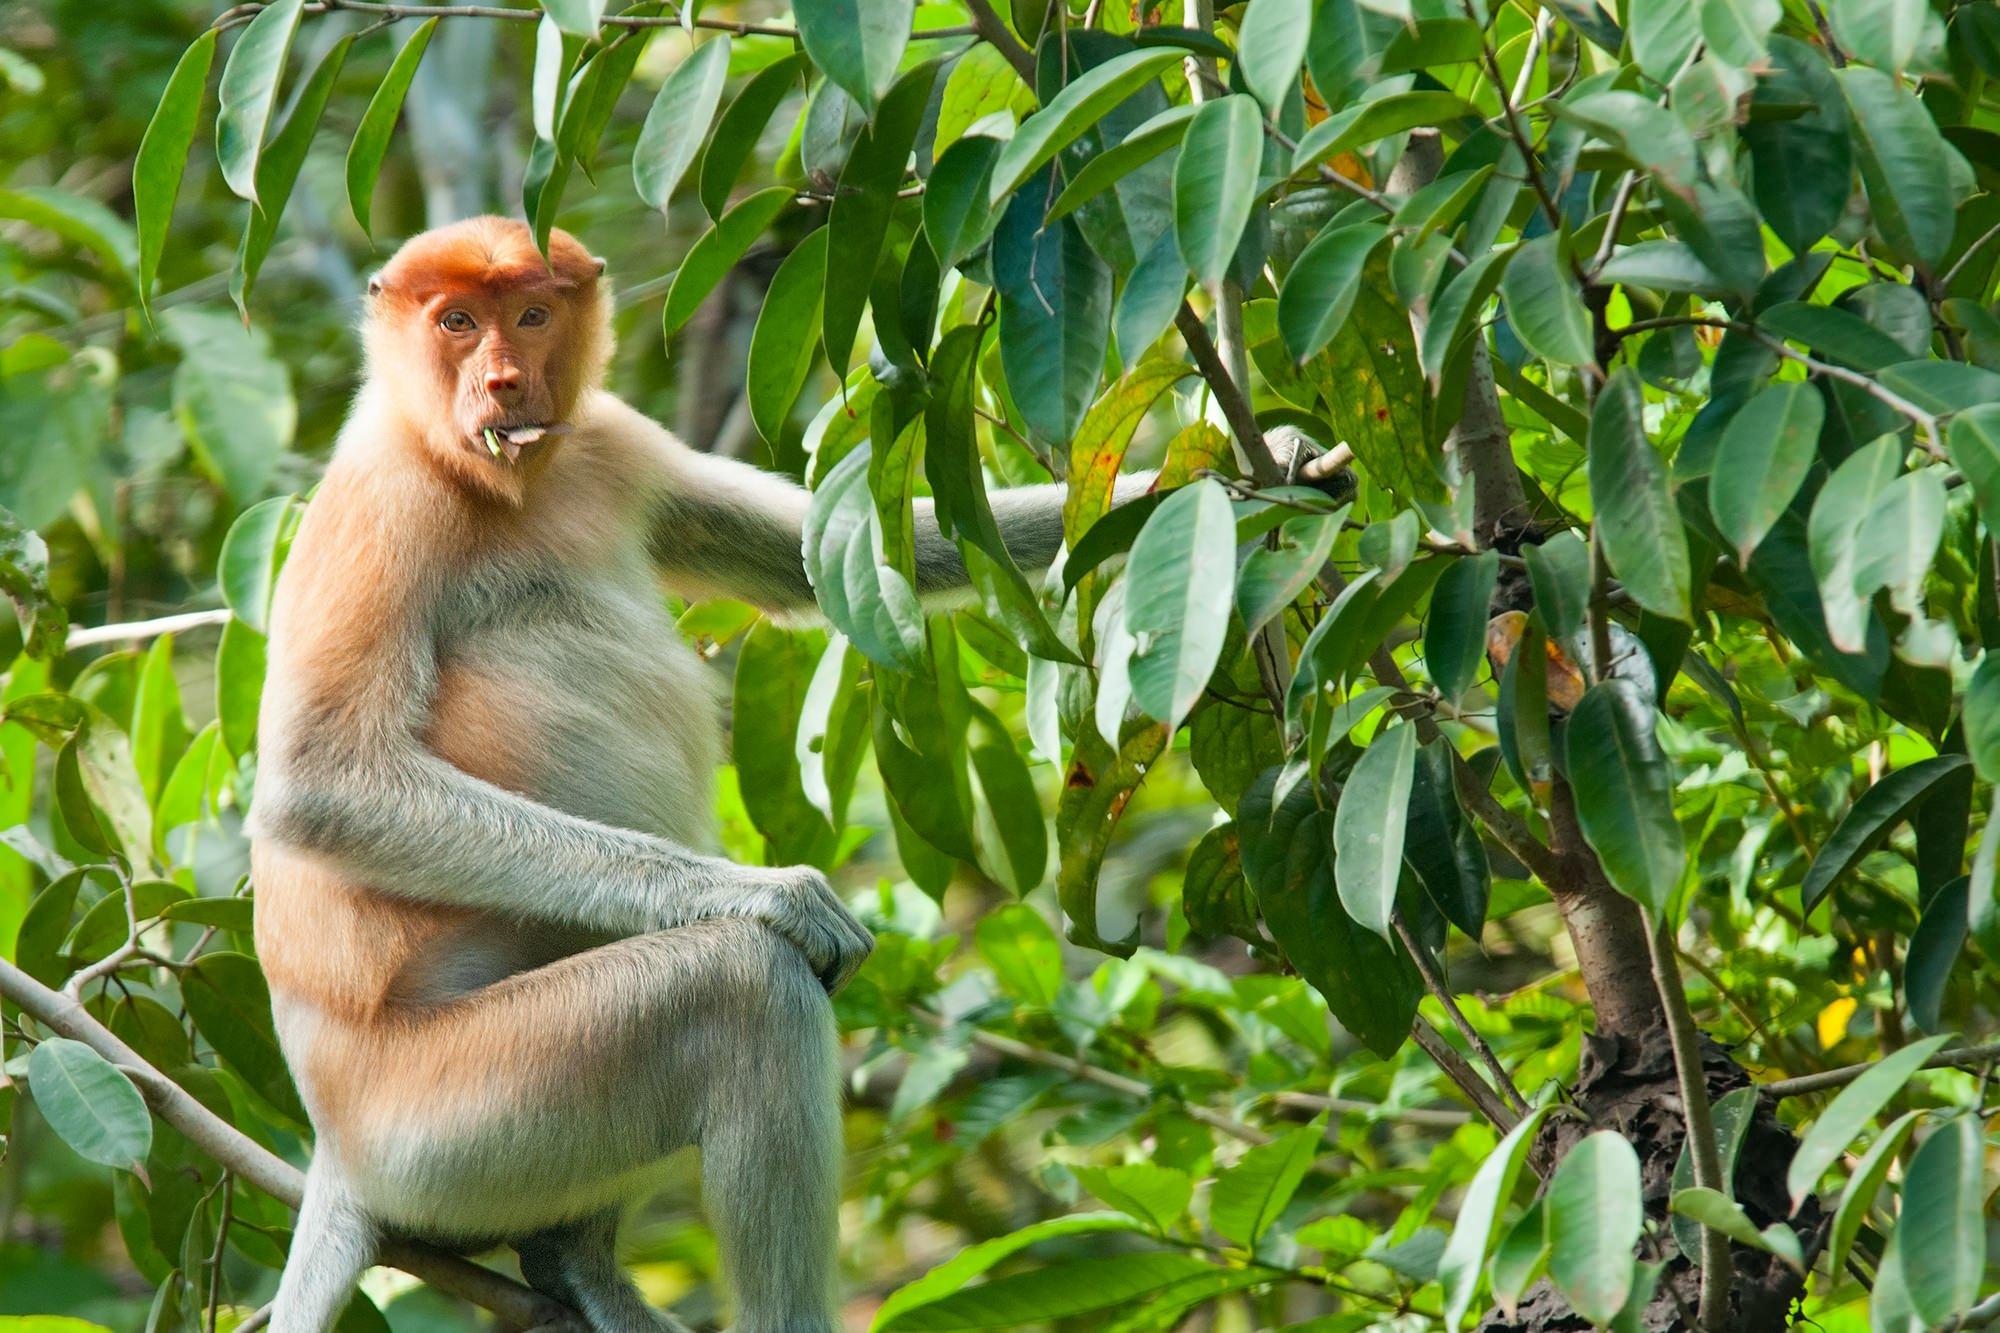 Wildlife of Kinabatangan river - Female Proboscis monkey